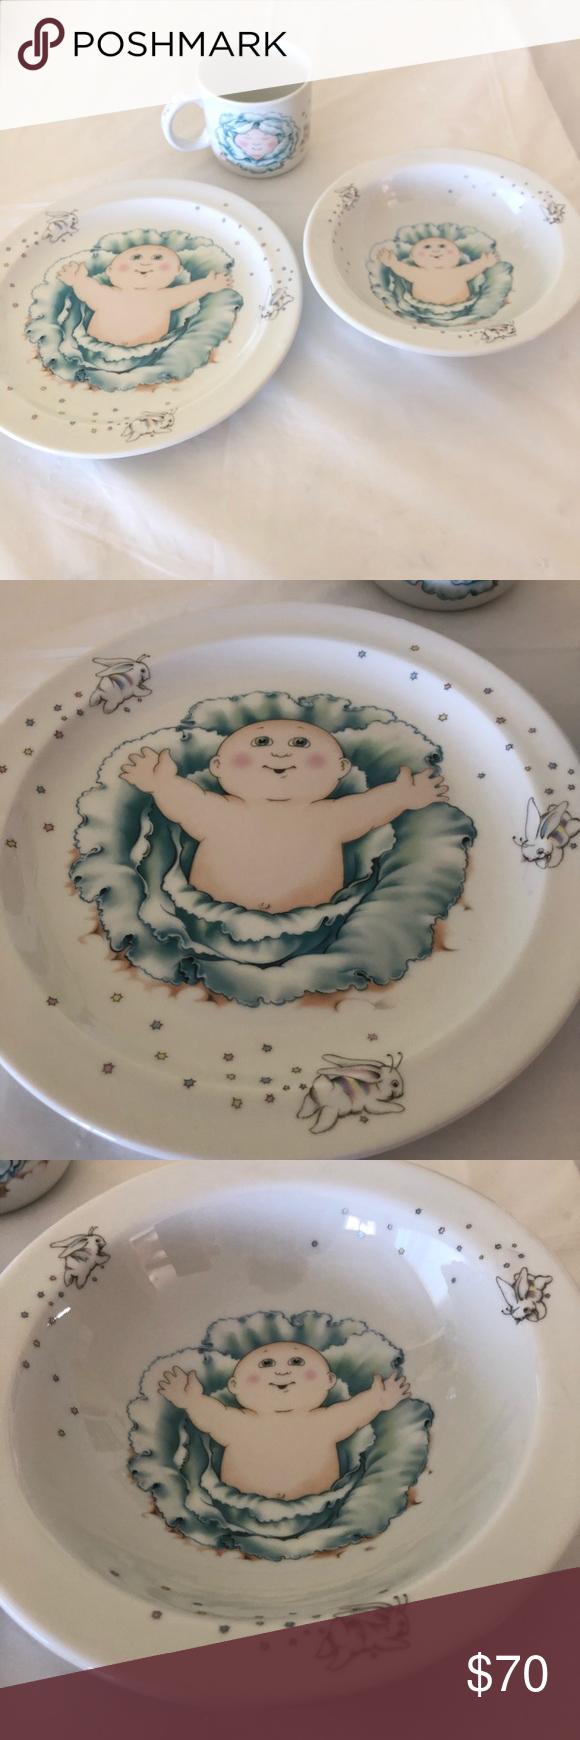 1984 Cabbage Patch Royal Worcester Fine Porcelain In 2021 Kids Dishes Fine Porcelain Kids Dining